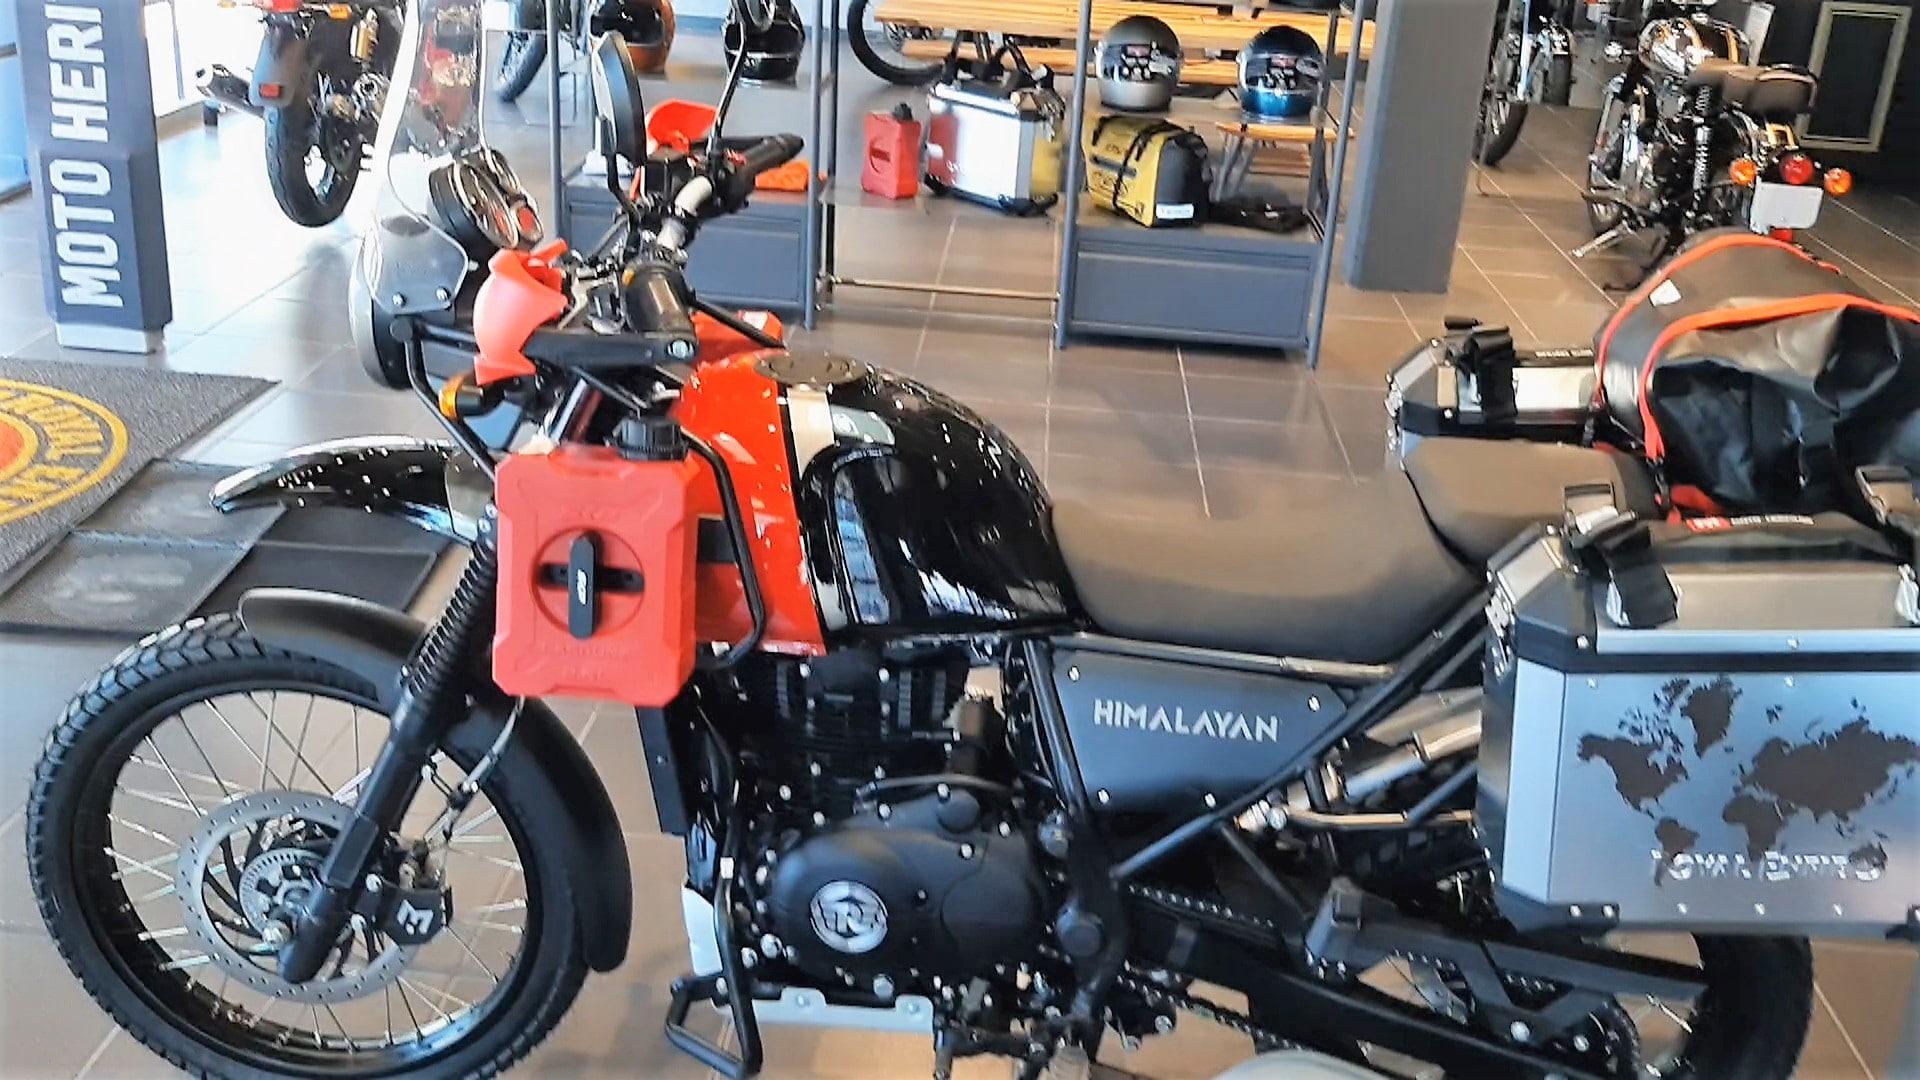 moto para viajes largos